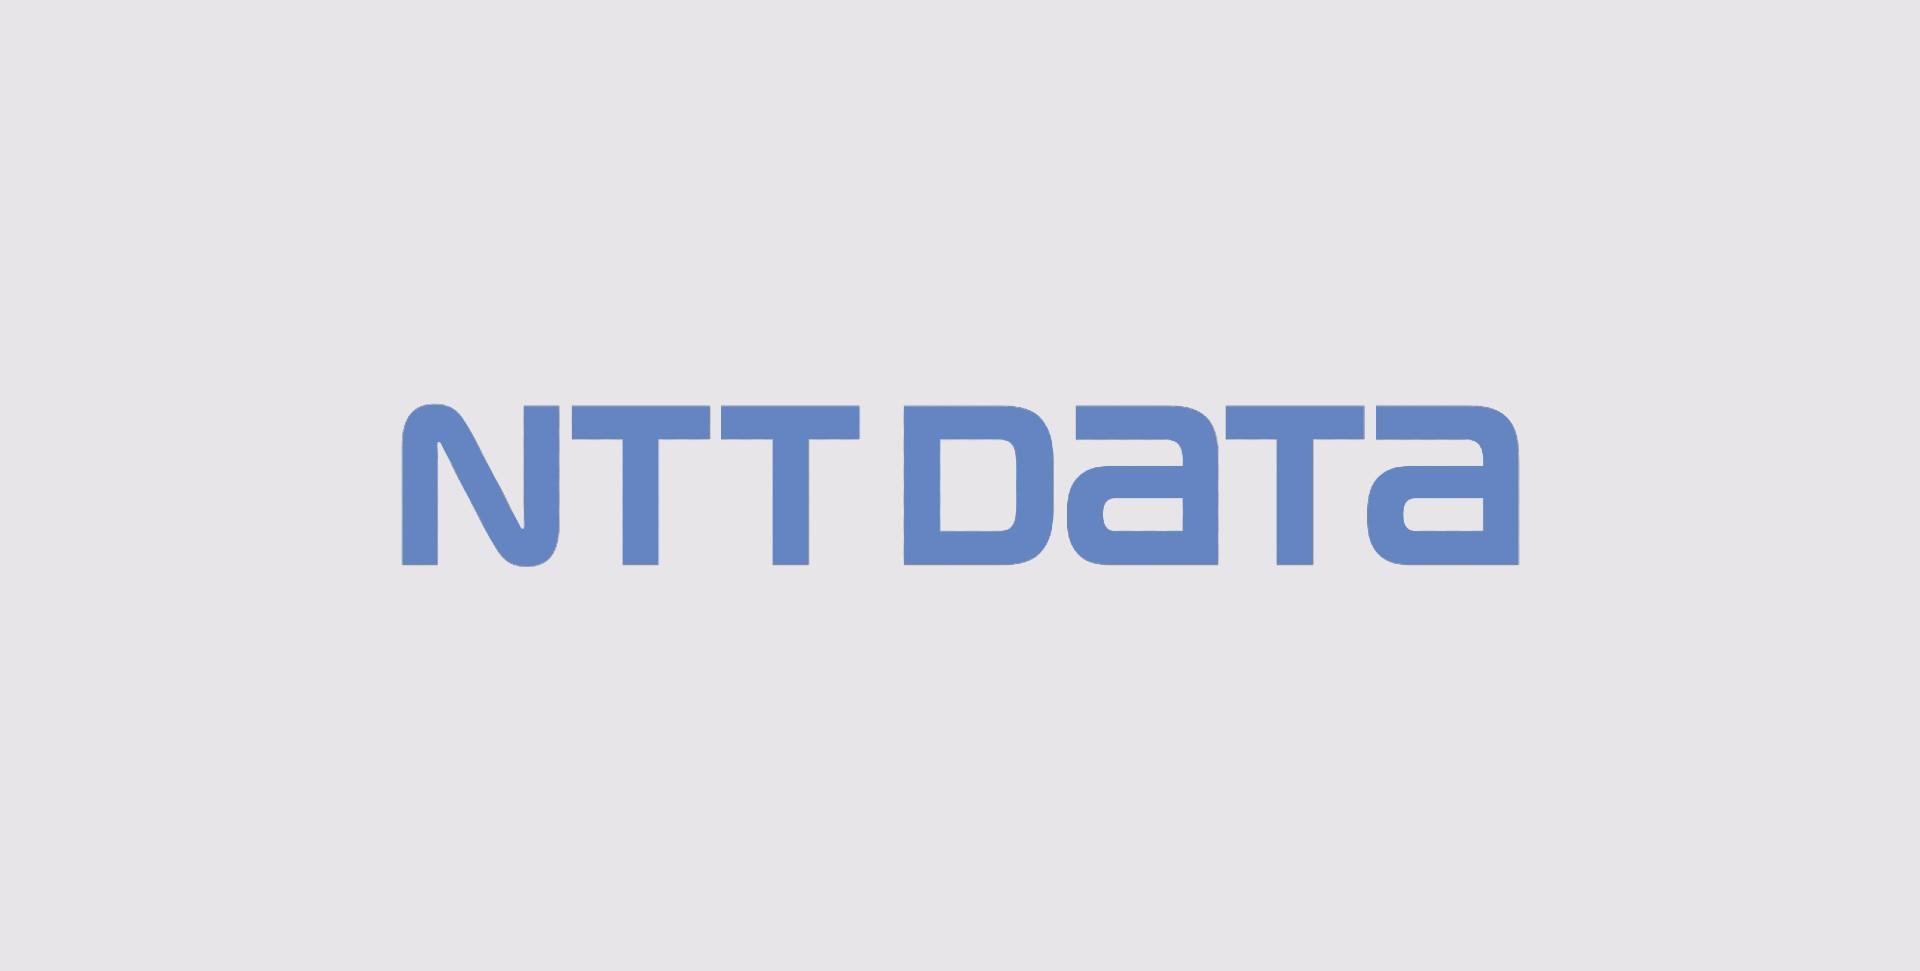 NTTDATA chooses cloudify